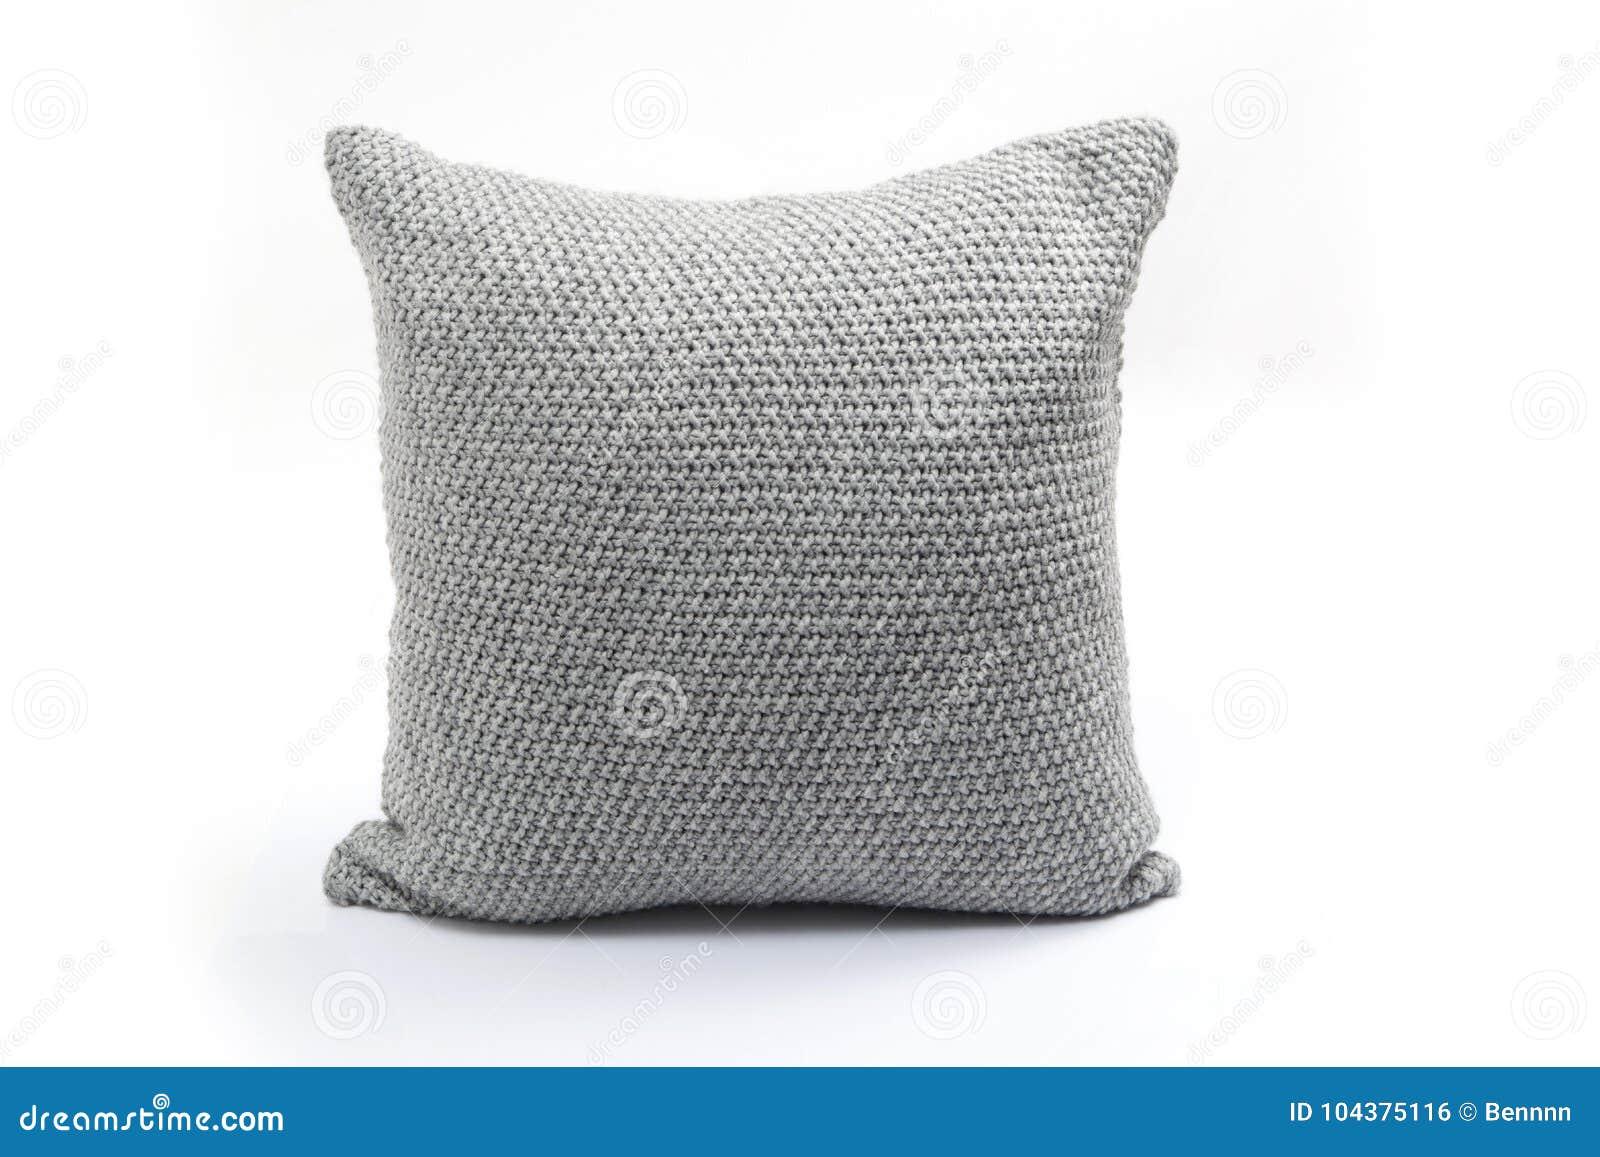 Decorated cushion